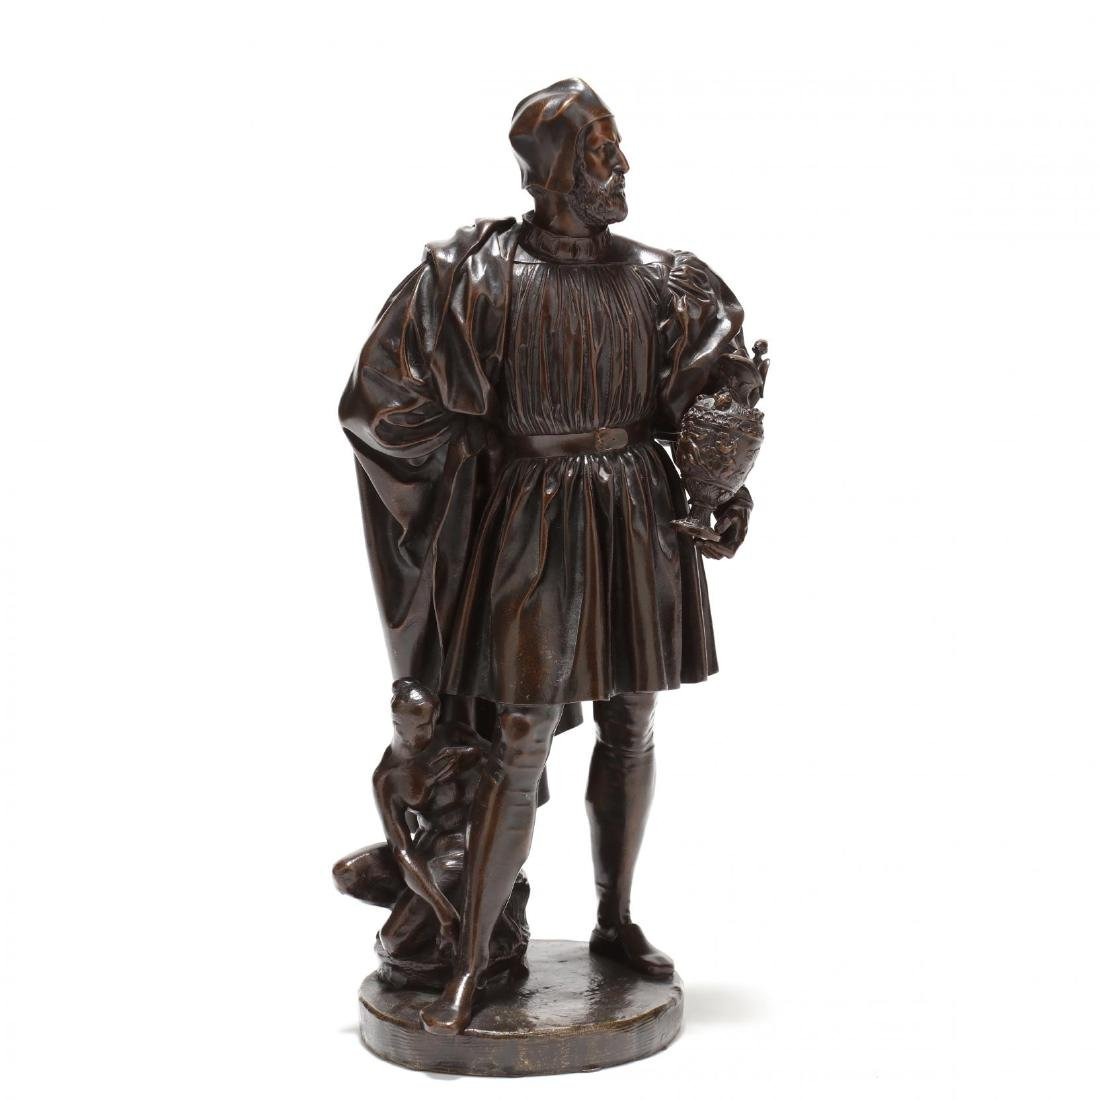 Antique Bronze Sculpture of a Renaissance Man